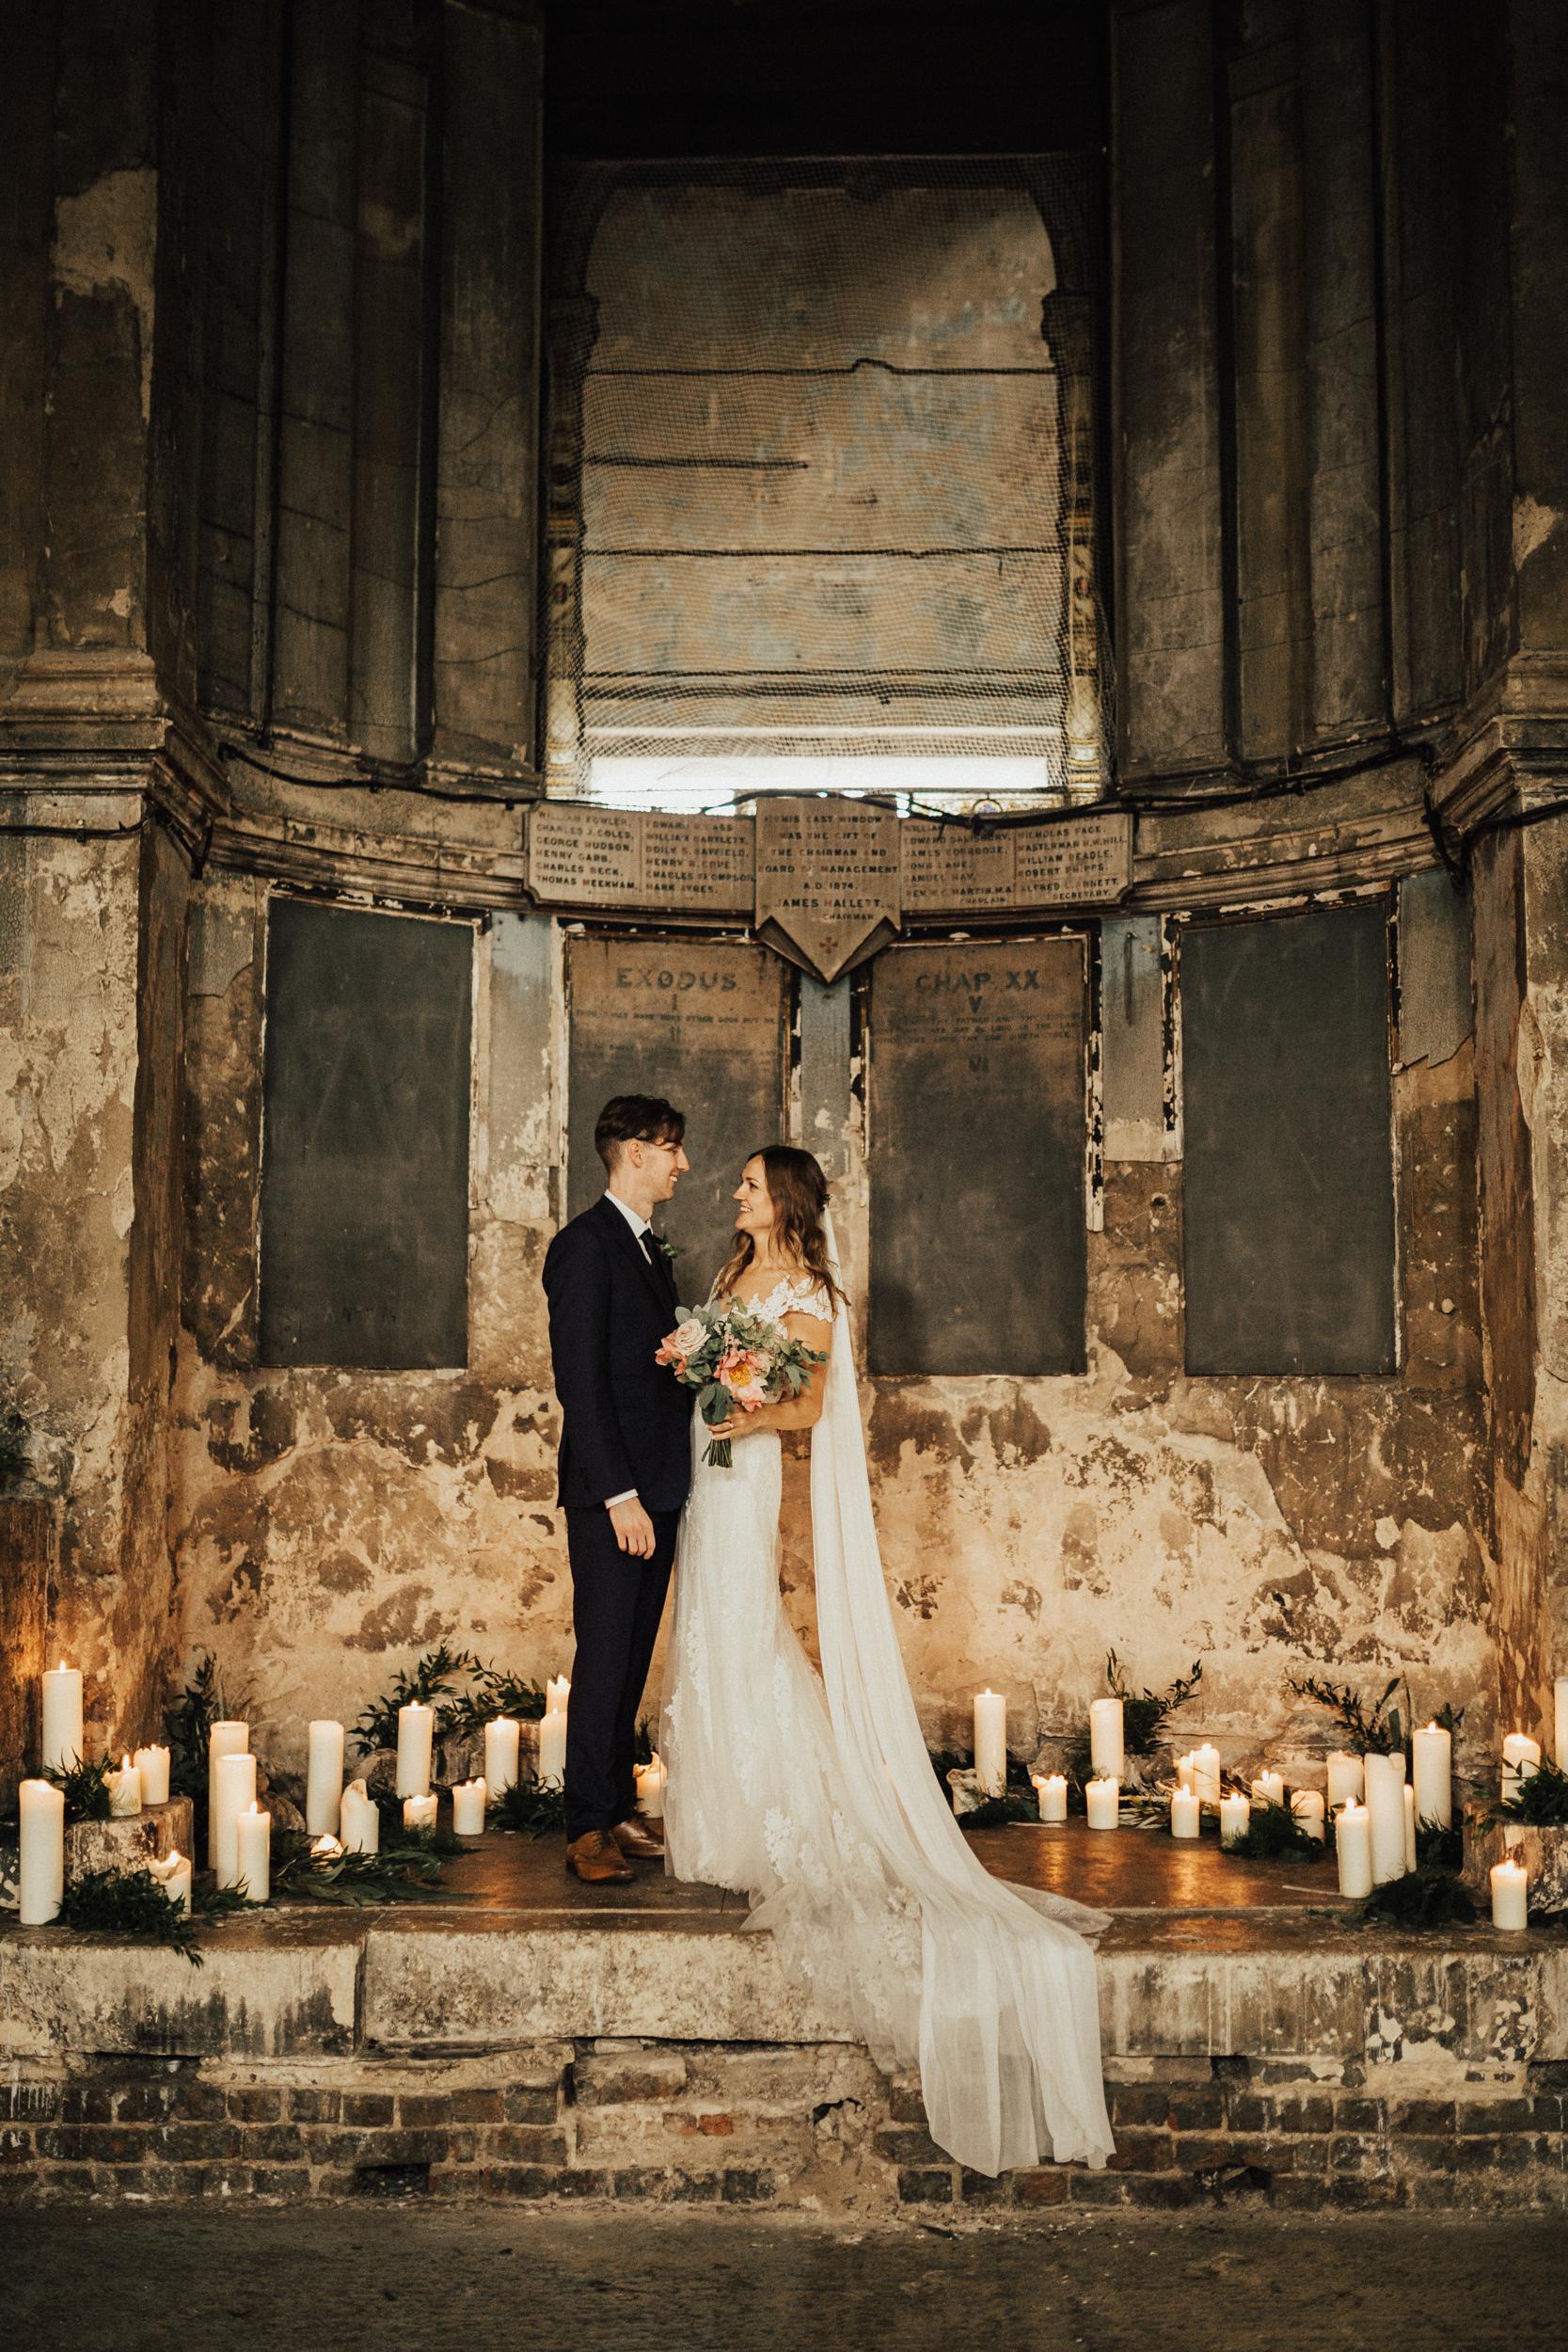 Laura-Benn-The-Asylum-London-The-Ace-Hotel-Wedding-Alternative-Darina-Stoda-Photography-321.jpg